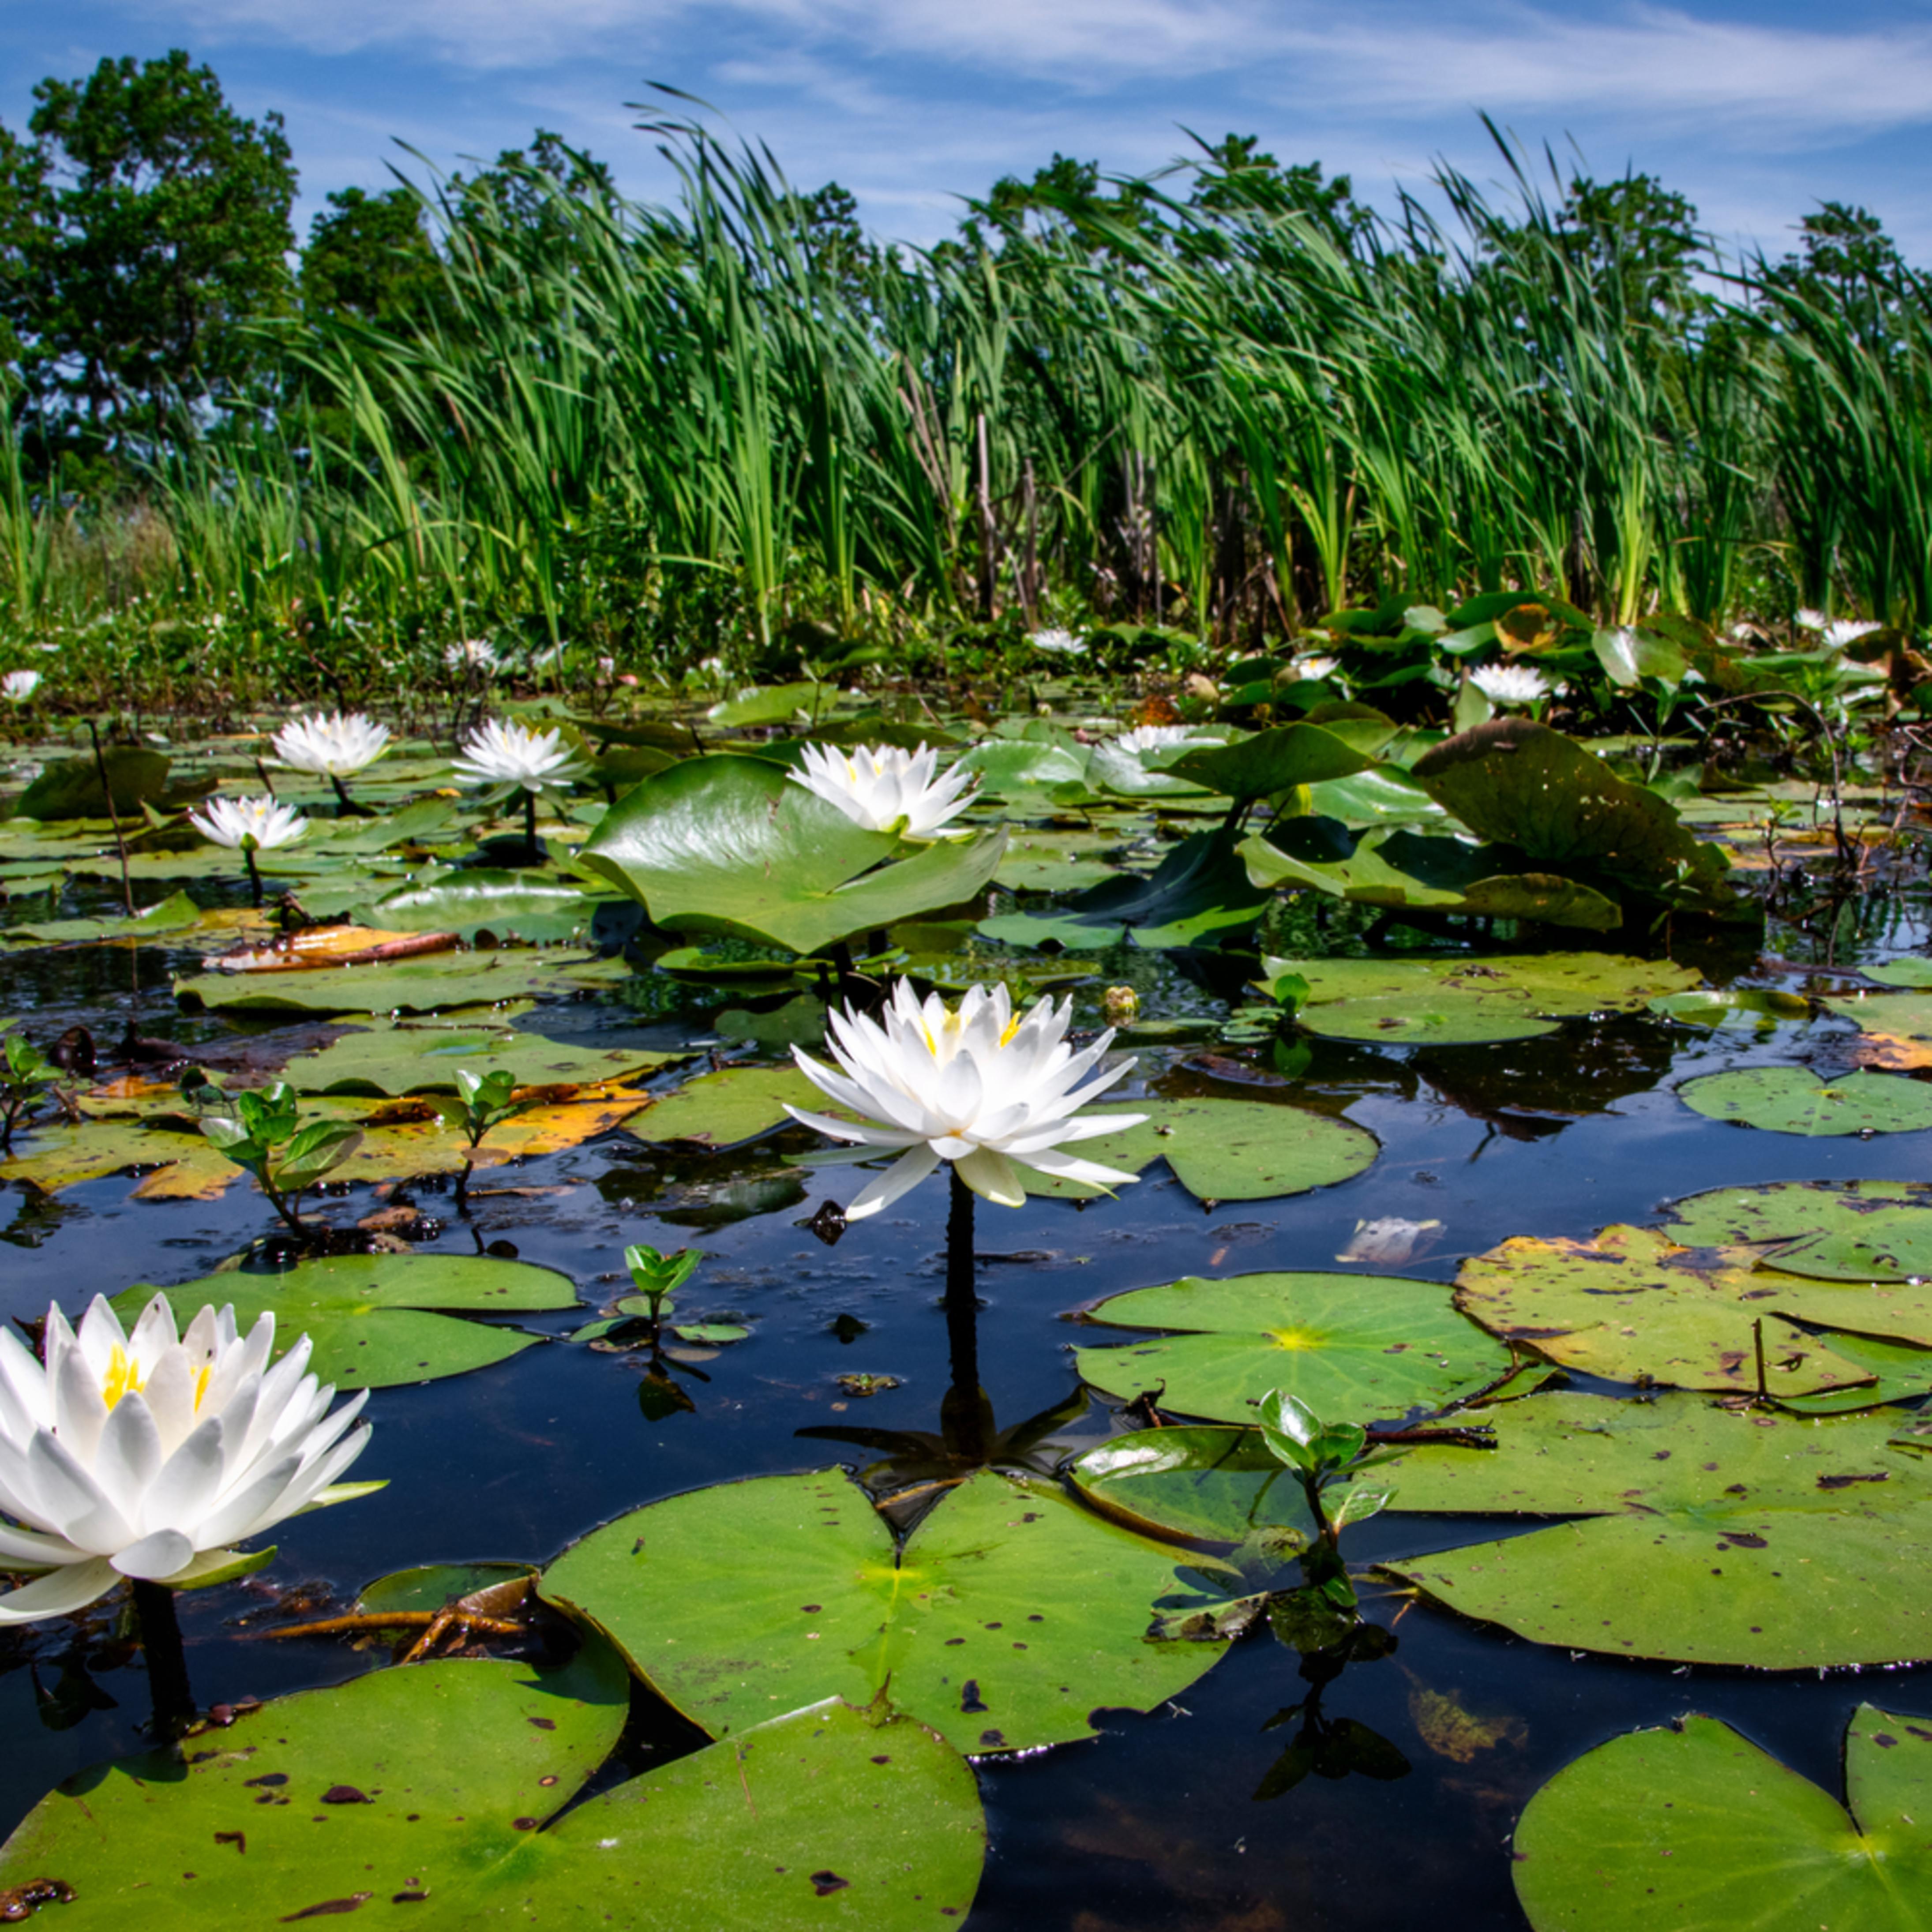 Andy crawford photography american lotus panoramic vista 1 bbkx78